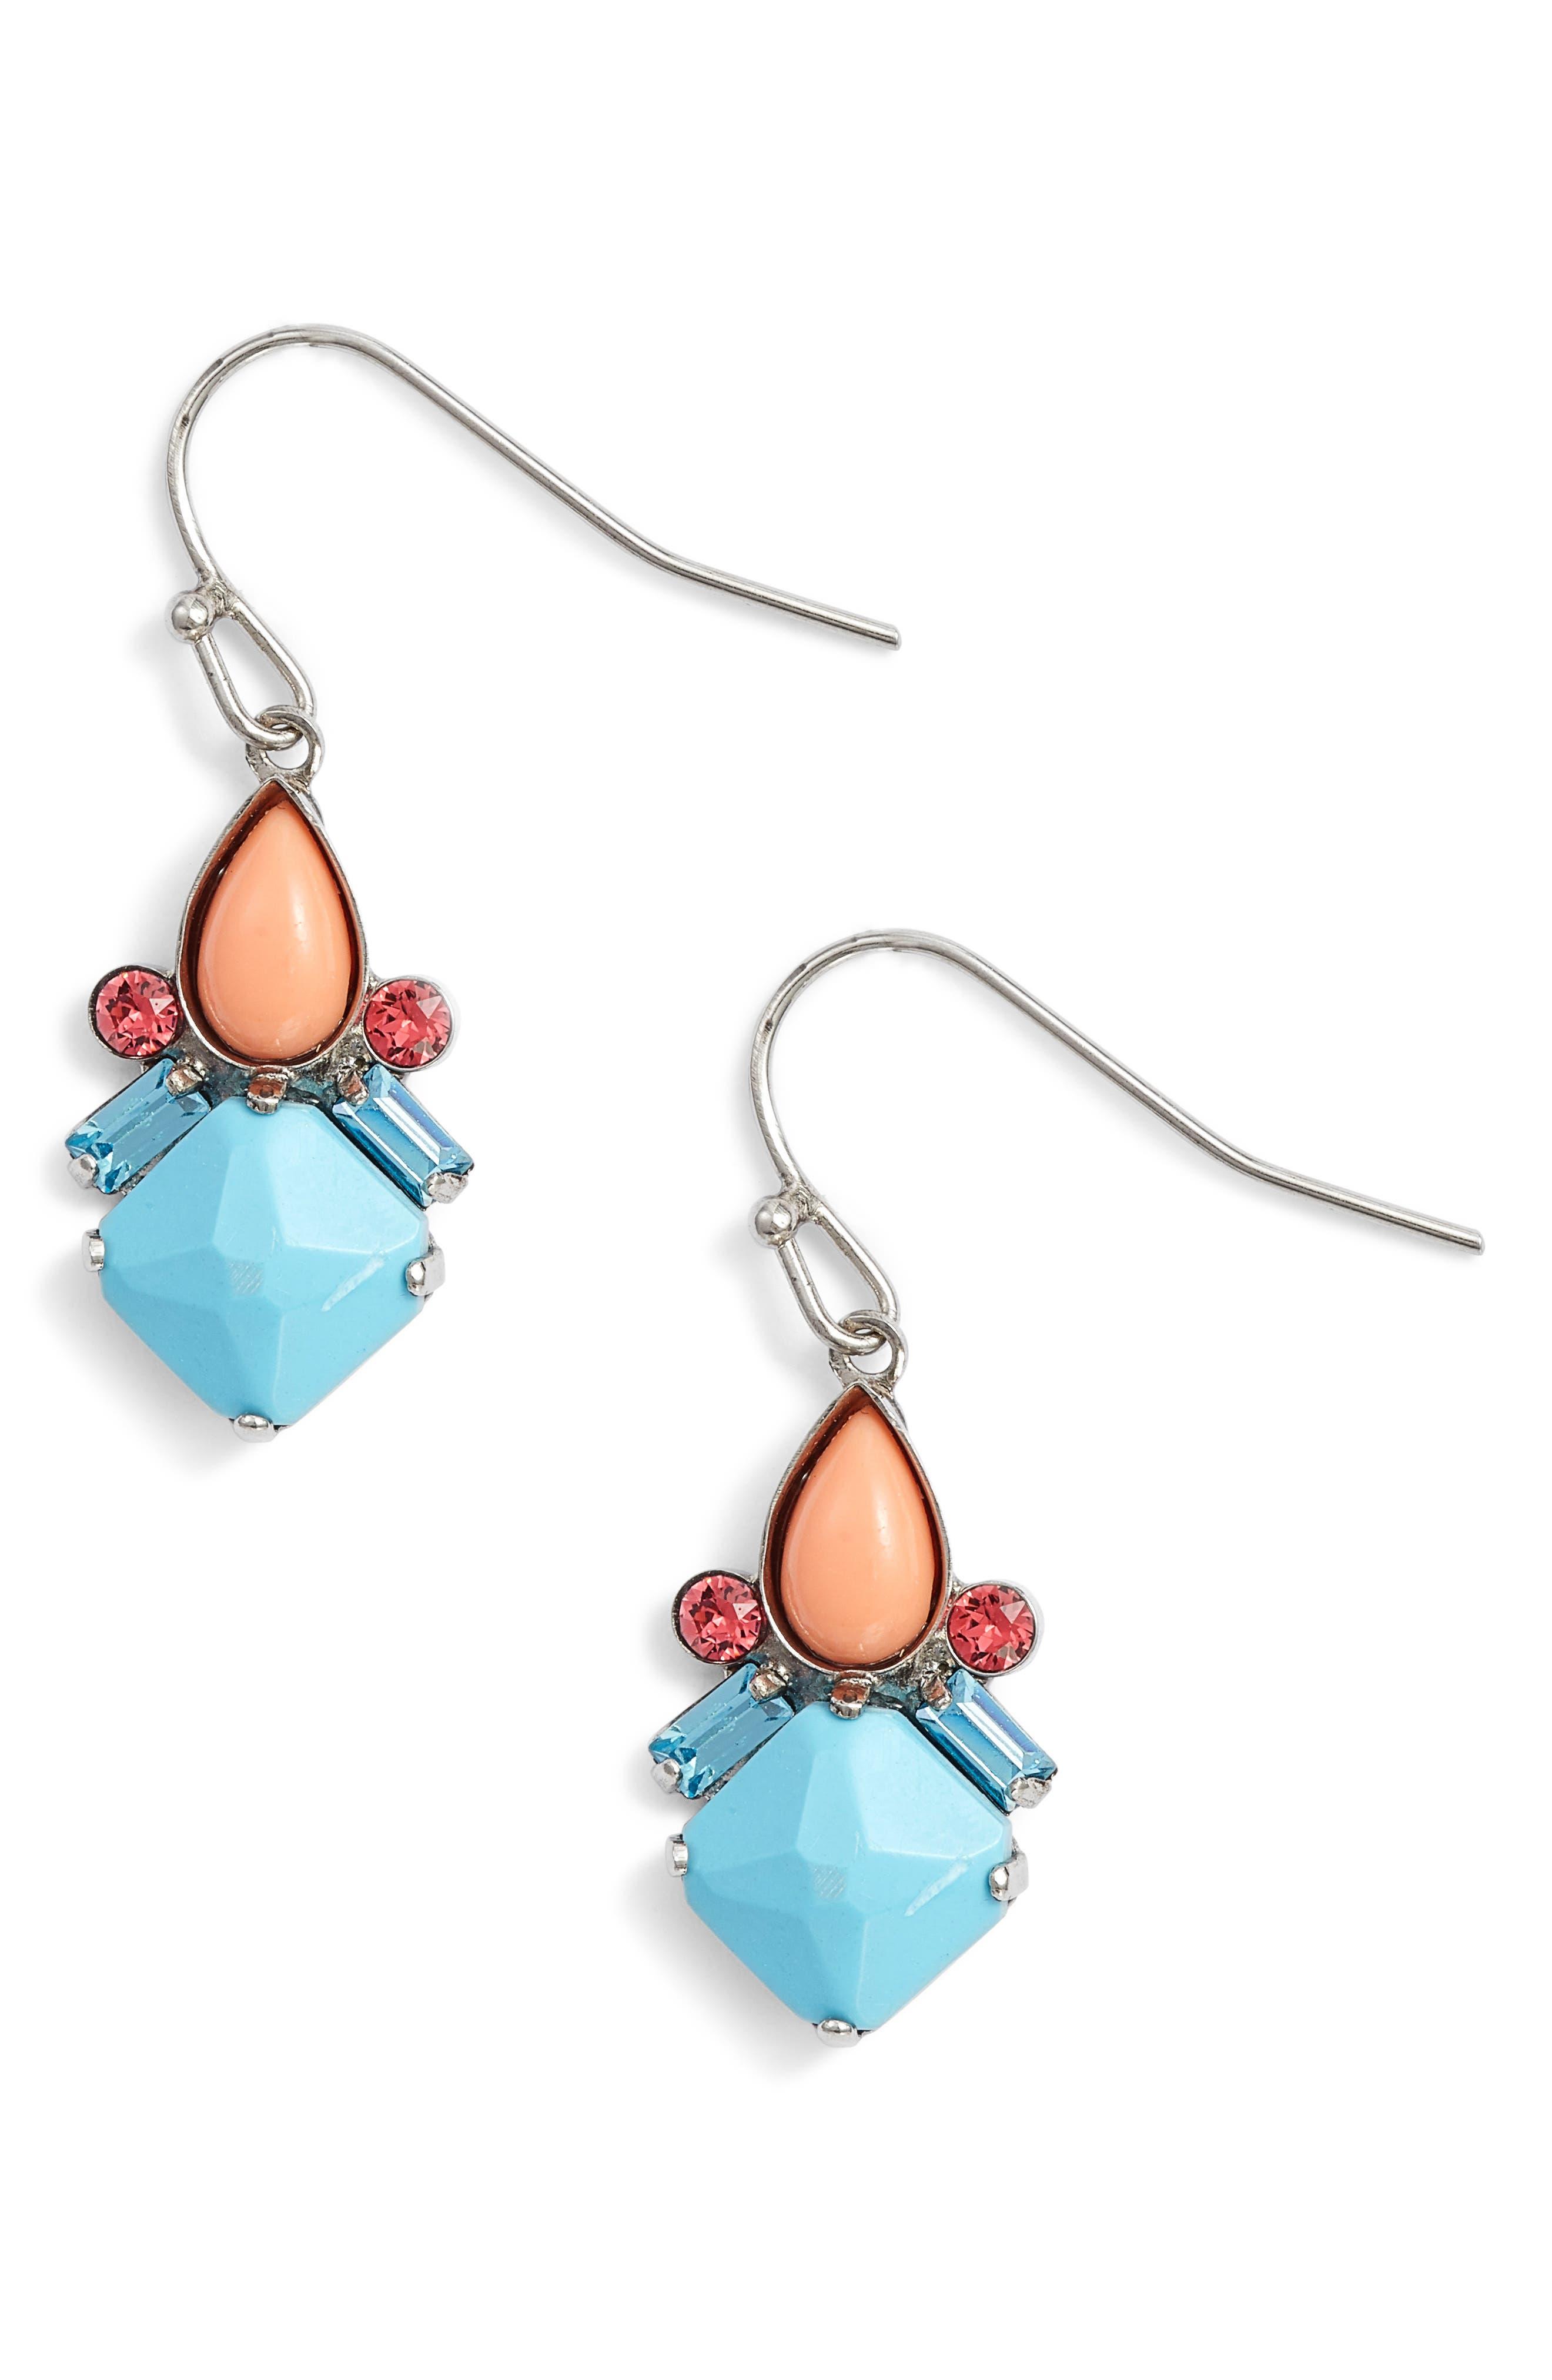 Cassia Earrings,                             Main thumbnail 1, color,                             Aqua/ Orange